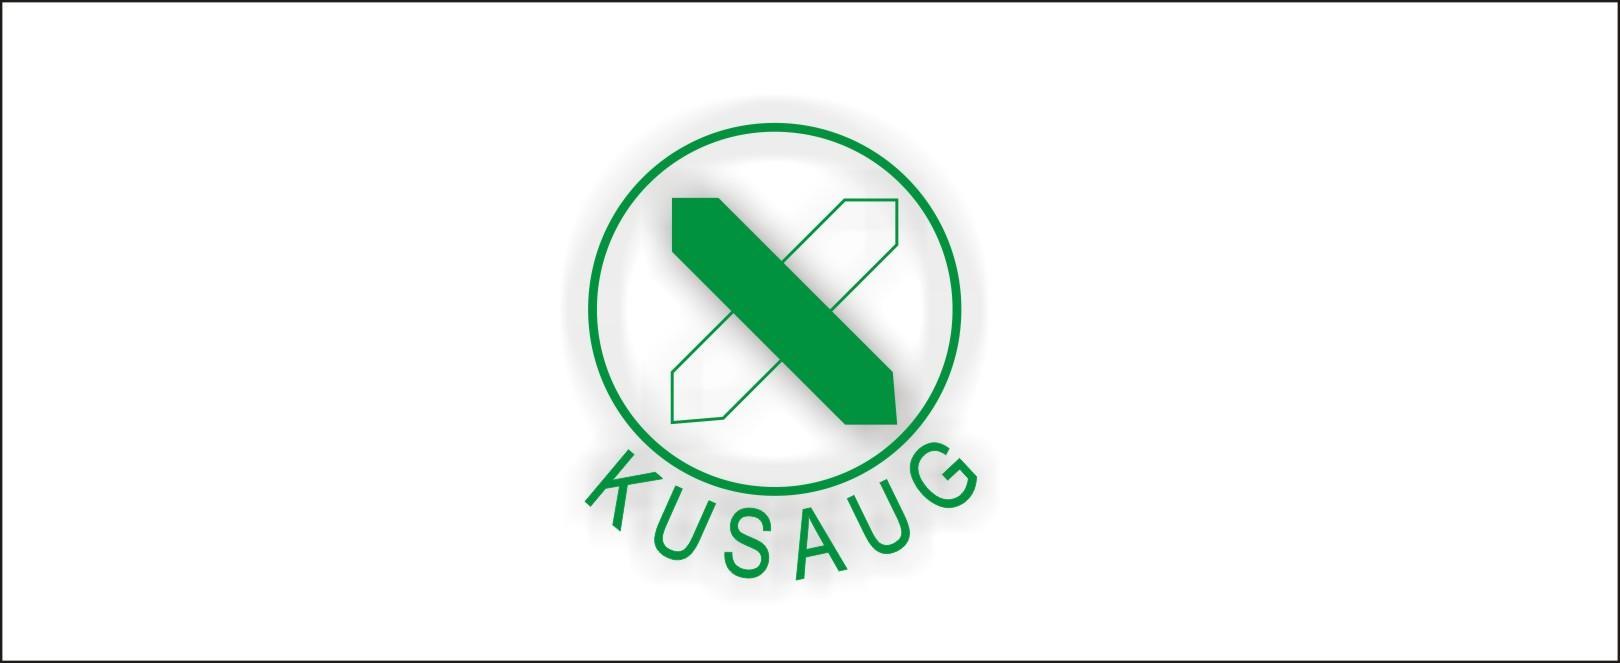 logo logo 标志 设计 图标 1620_663